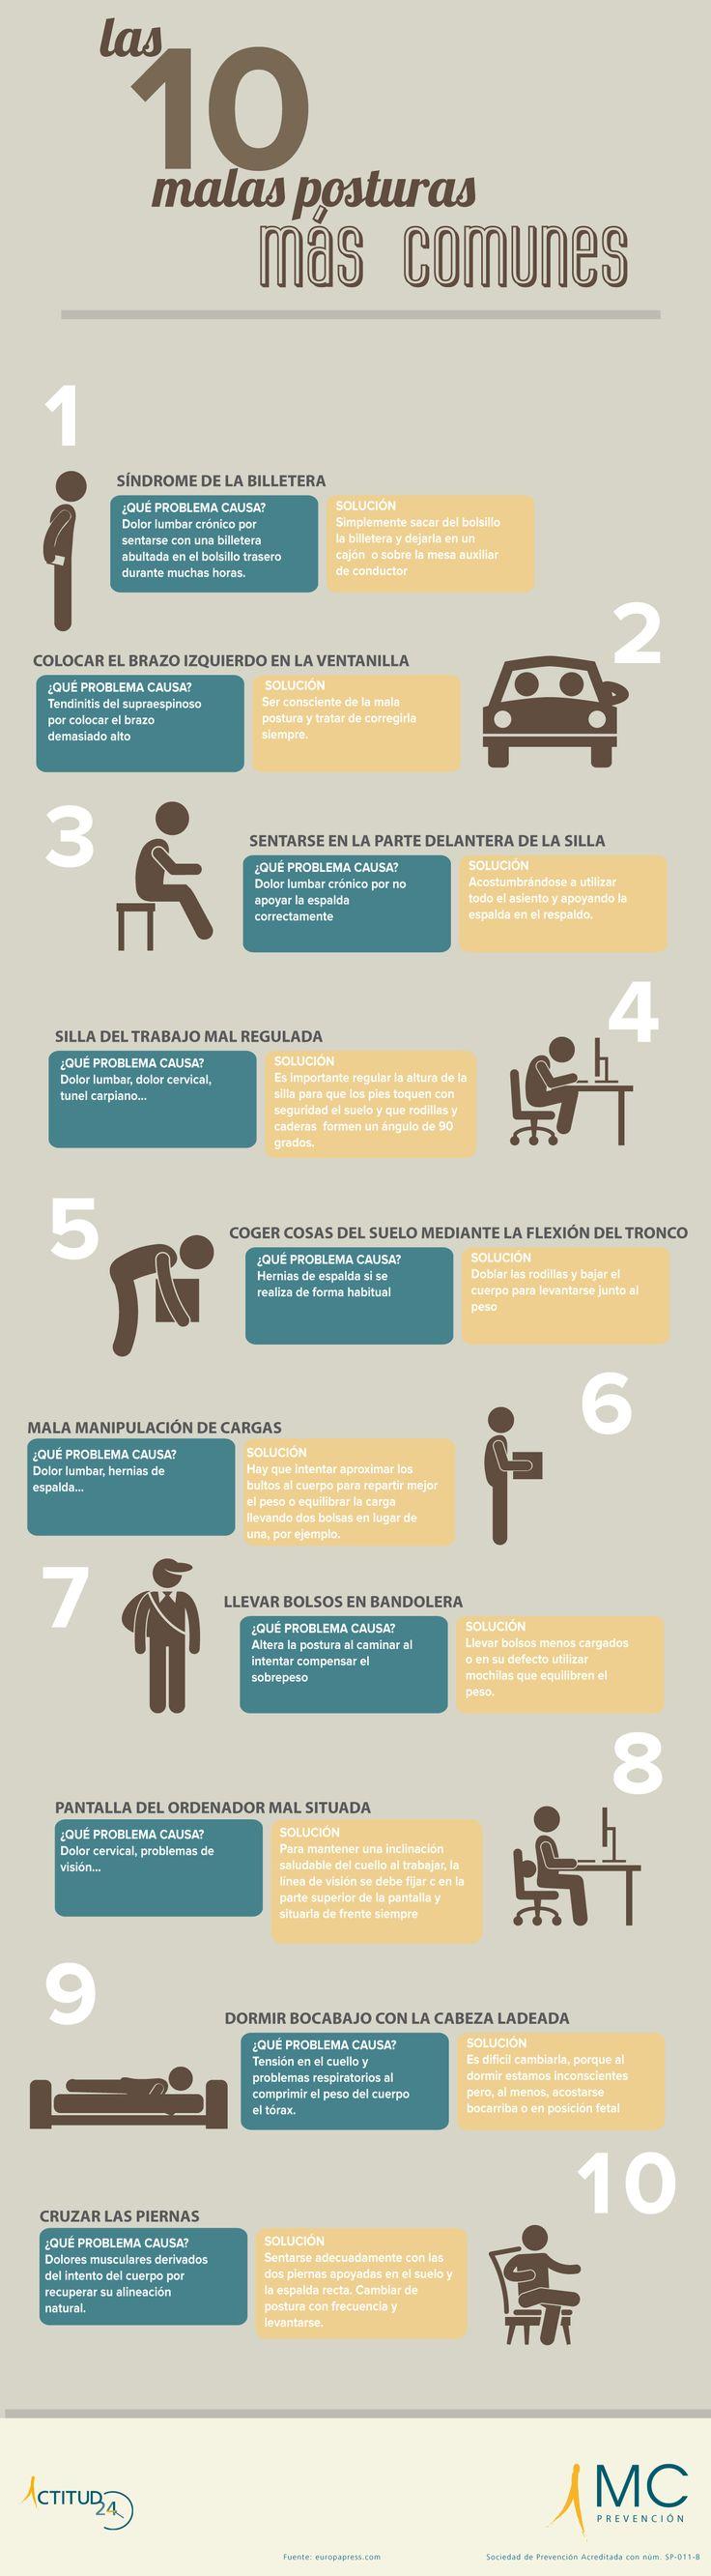 10 malas posturas que producen dolores musculares #infografia #infographic #health vía: http://www.actitud24.com